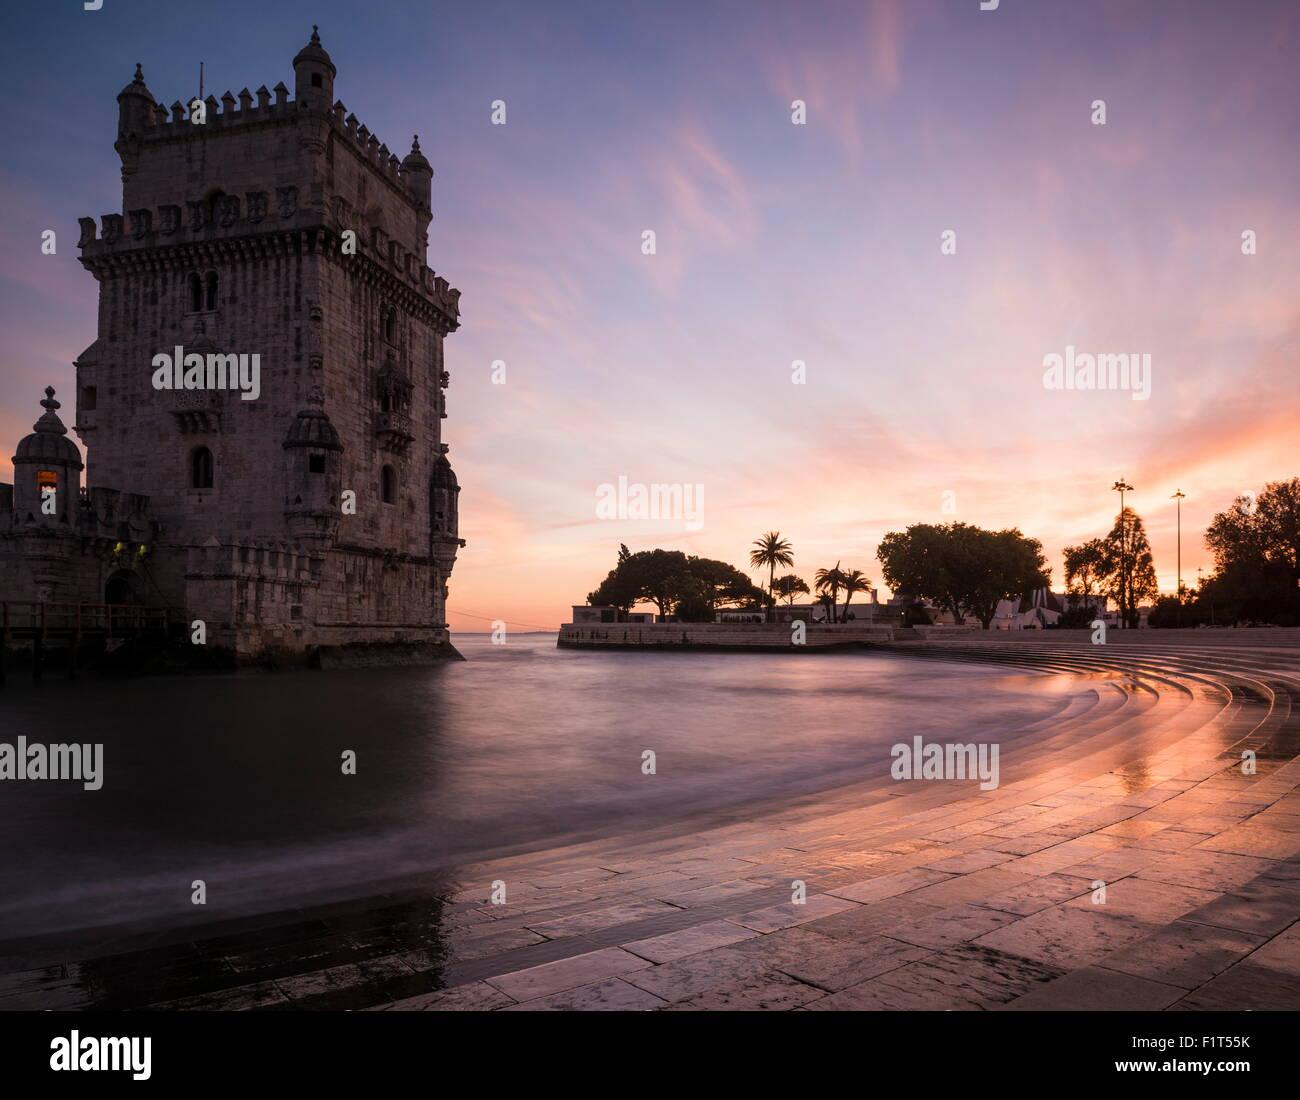 Torre de Belem al atardecer (Torre de Belem), Sitio de Patrimonio Mundial de la UNESCO, Lisboa, Portugal, Europa Imagen De Stock